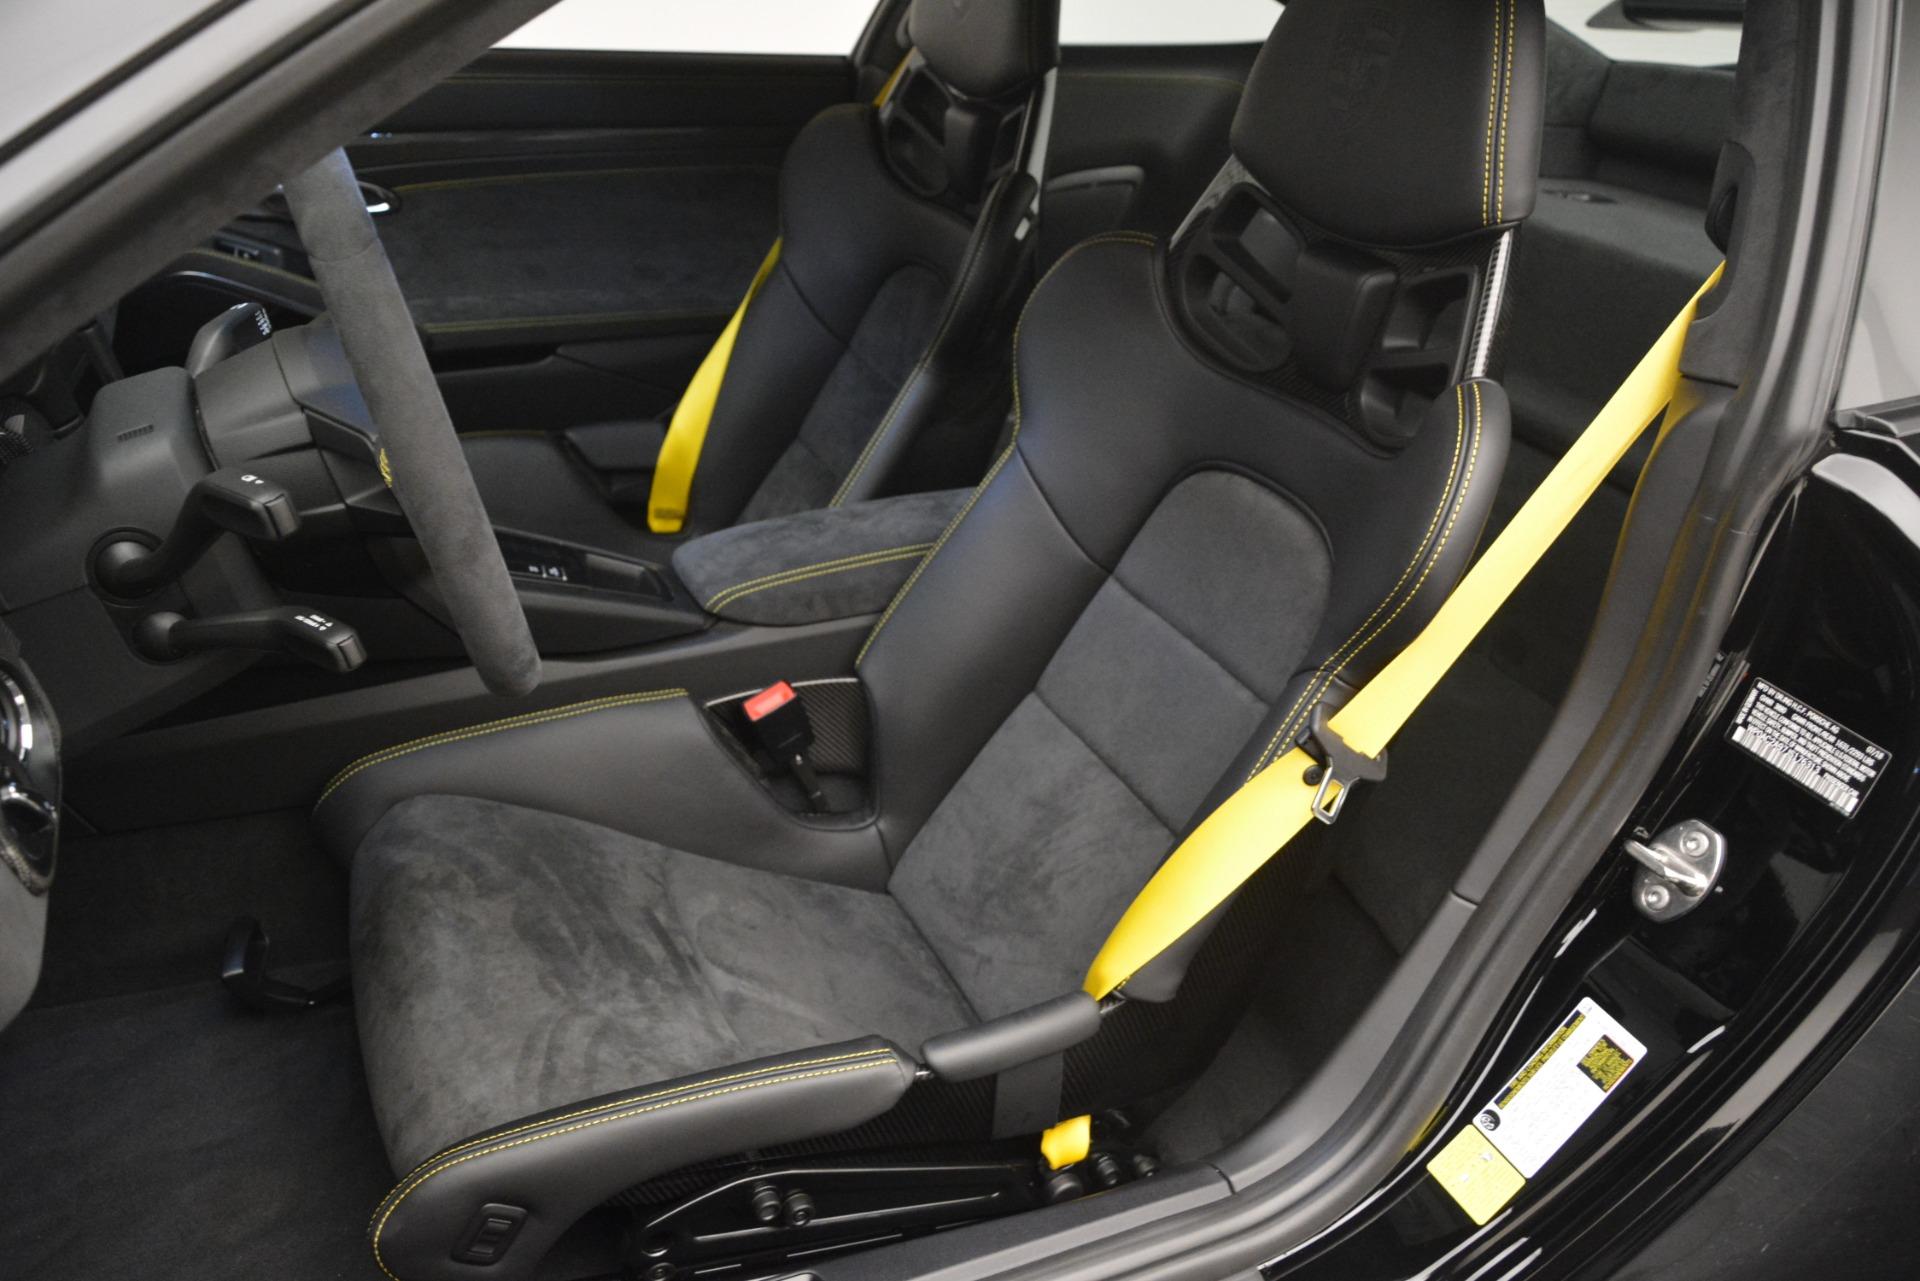 Used 2018 Porsche 911 GT3 For Sale In Greenwich, CT. Alfa Romeo of Greenwich, 7530 3056_p15